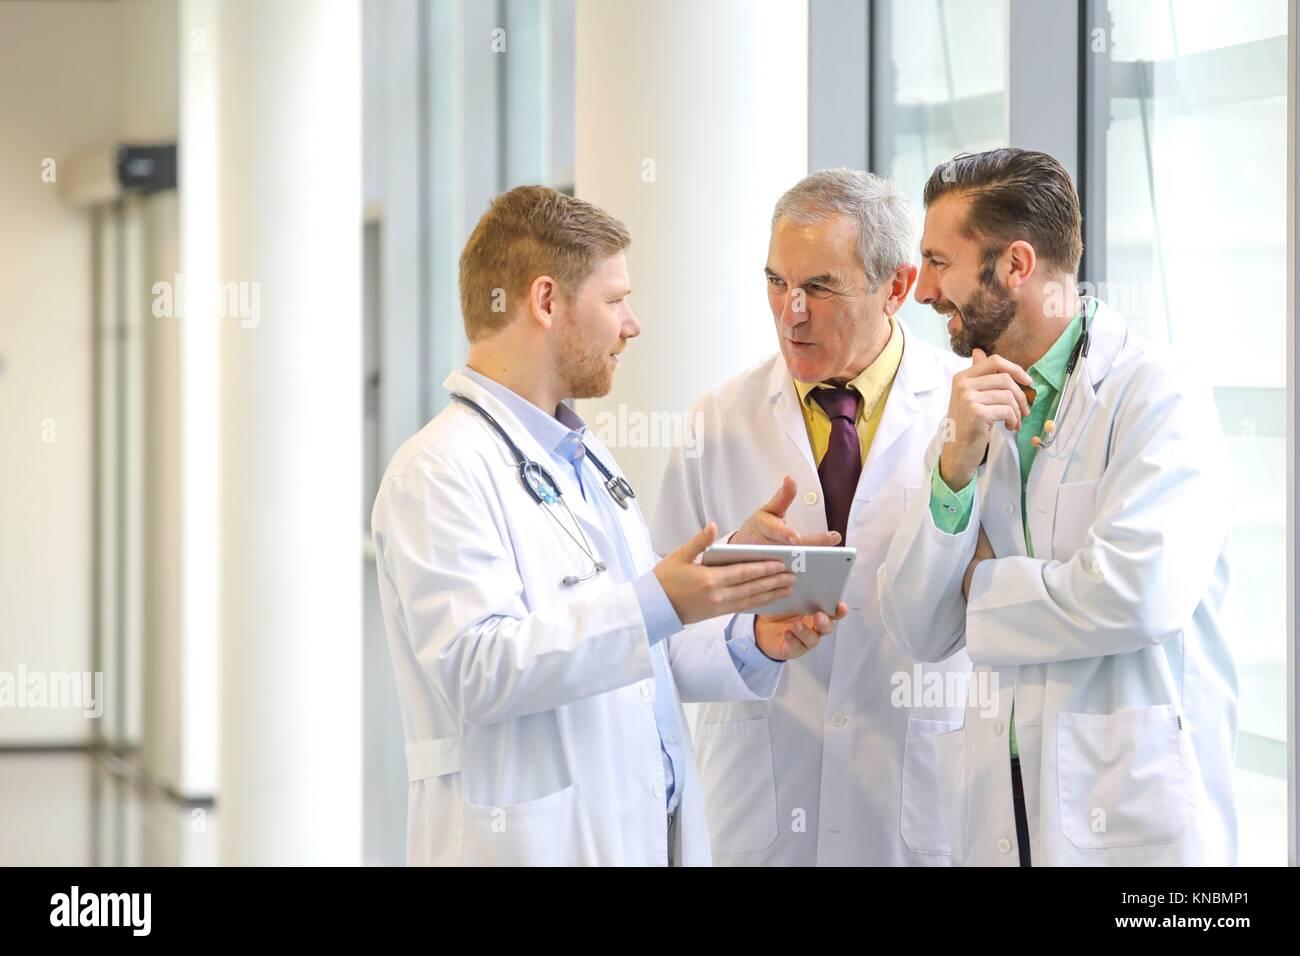 Doctors talking in corridor, Hospital - Stock Image